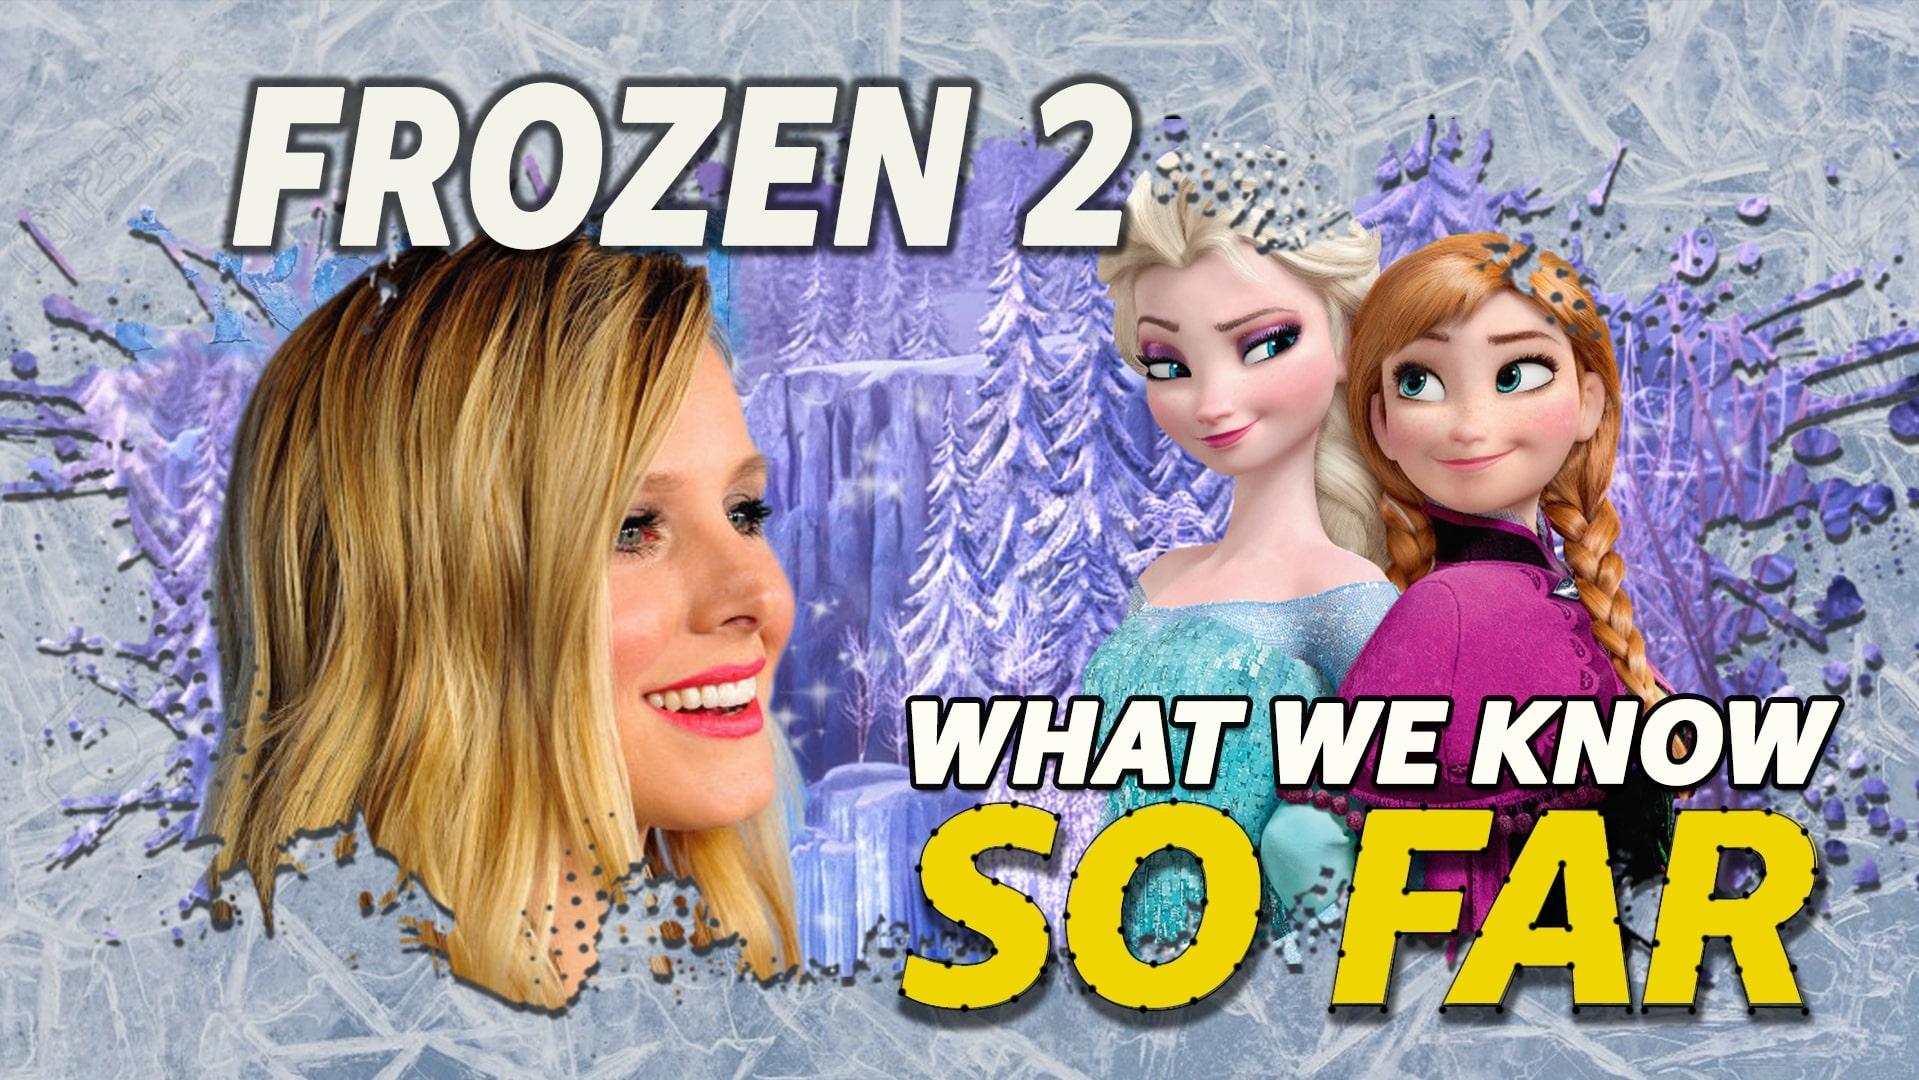 Frozen 2 2019 Imdb